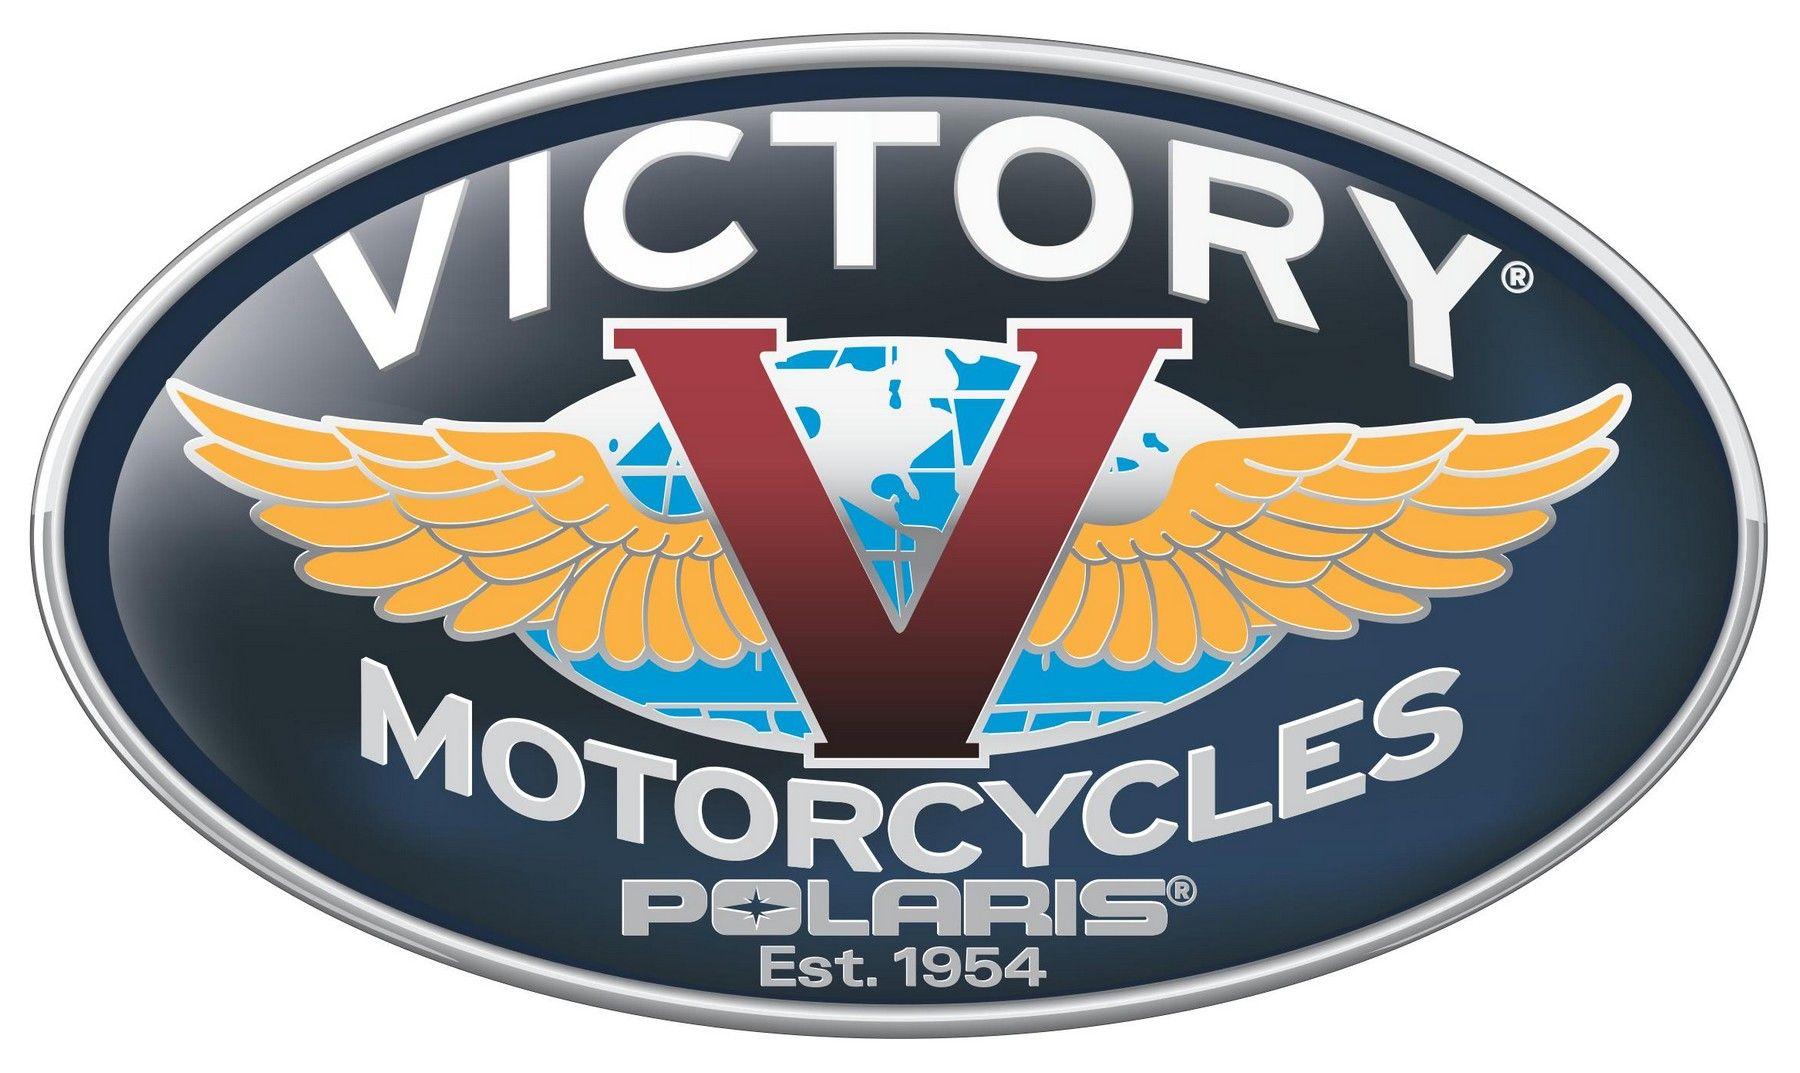 Victory motorcycles logo eps pdf car and motorcycle logos motorcycle tires biocorpaavc